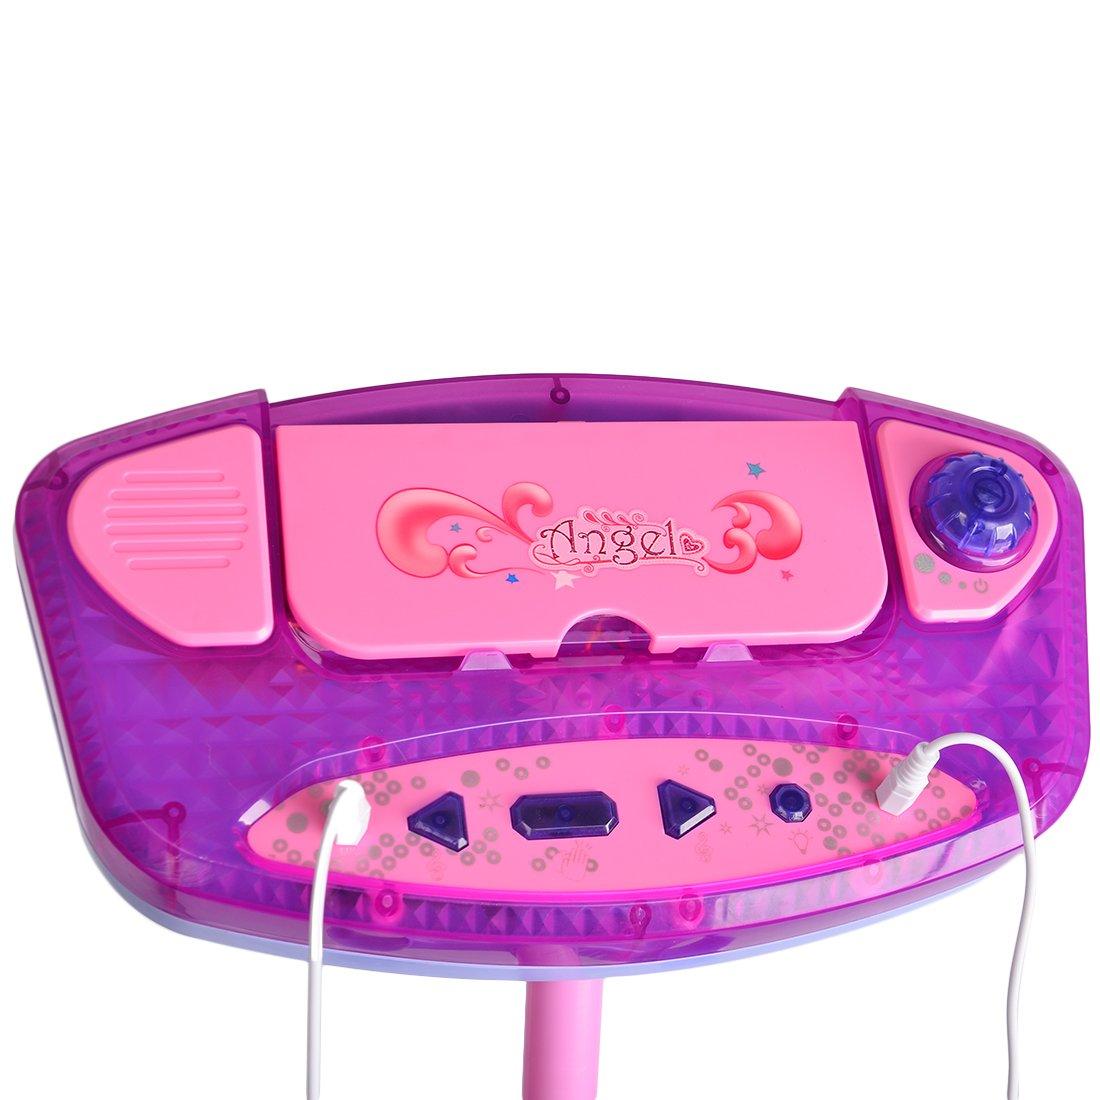 Tosbess Kids Karaoke Machine With 2 Microphones Adjustable Stand Elc Froggie Bubble Blower 139401 Music Play Set Blue